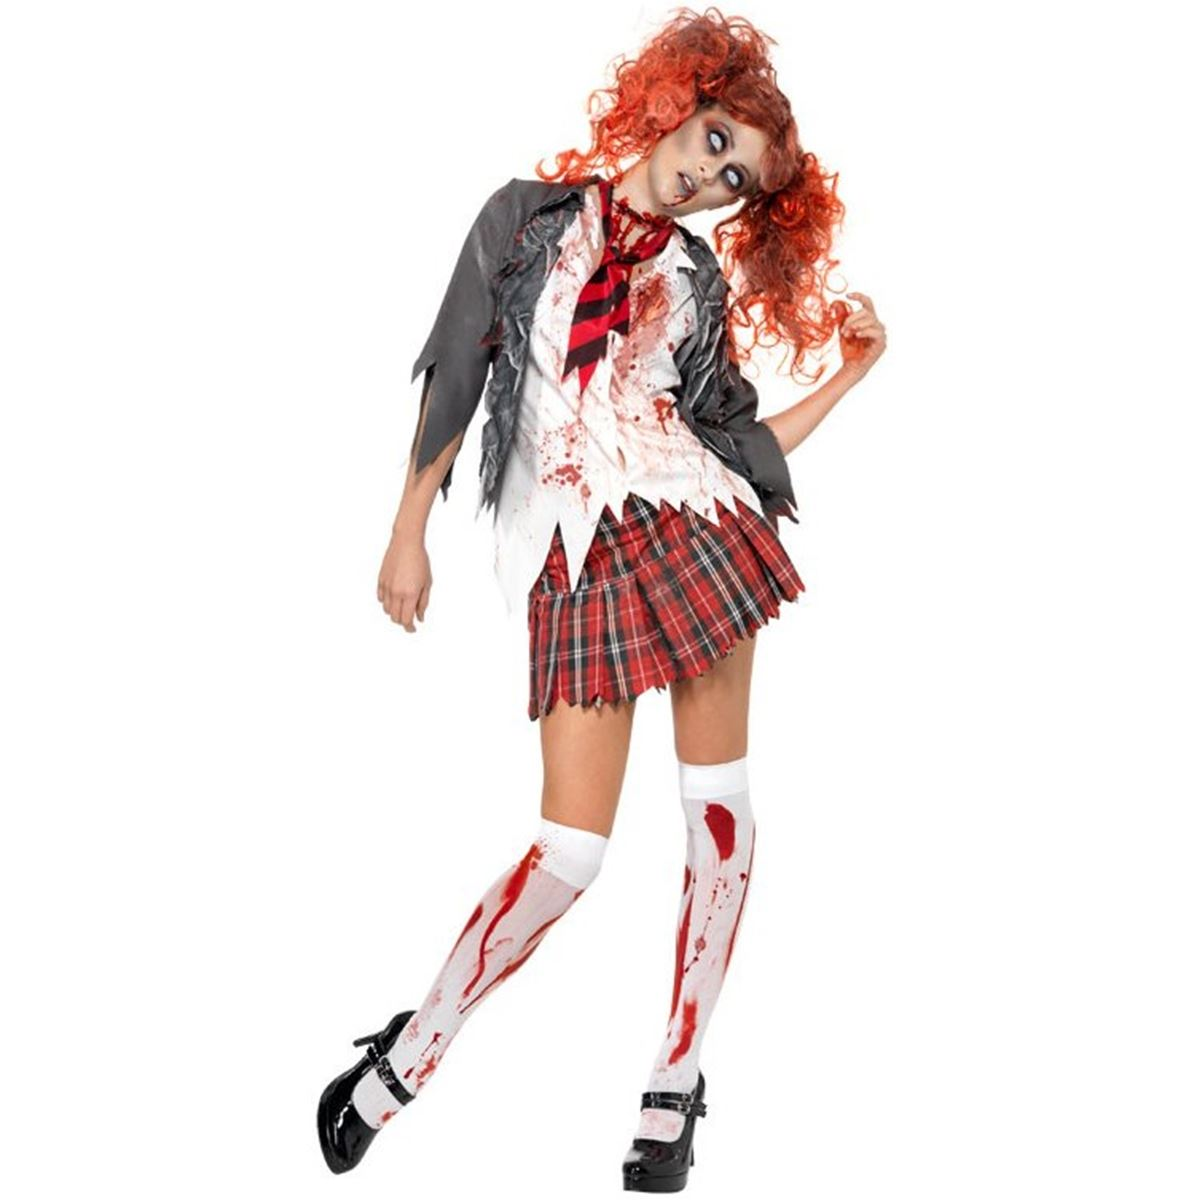 High School Horror Bloody Zombie School Girl Costume